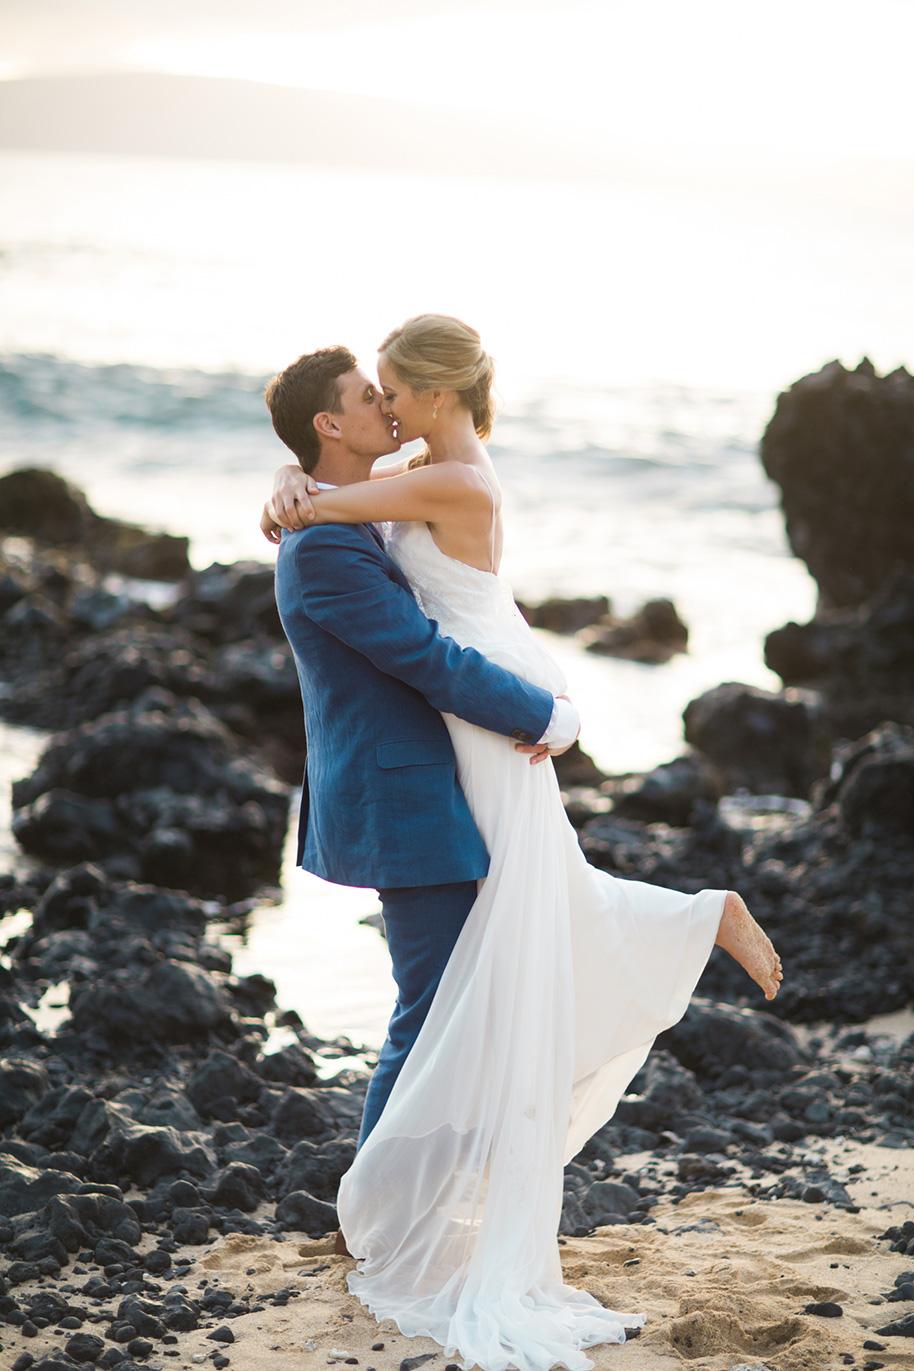 Maui-Wedding-060216-21